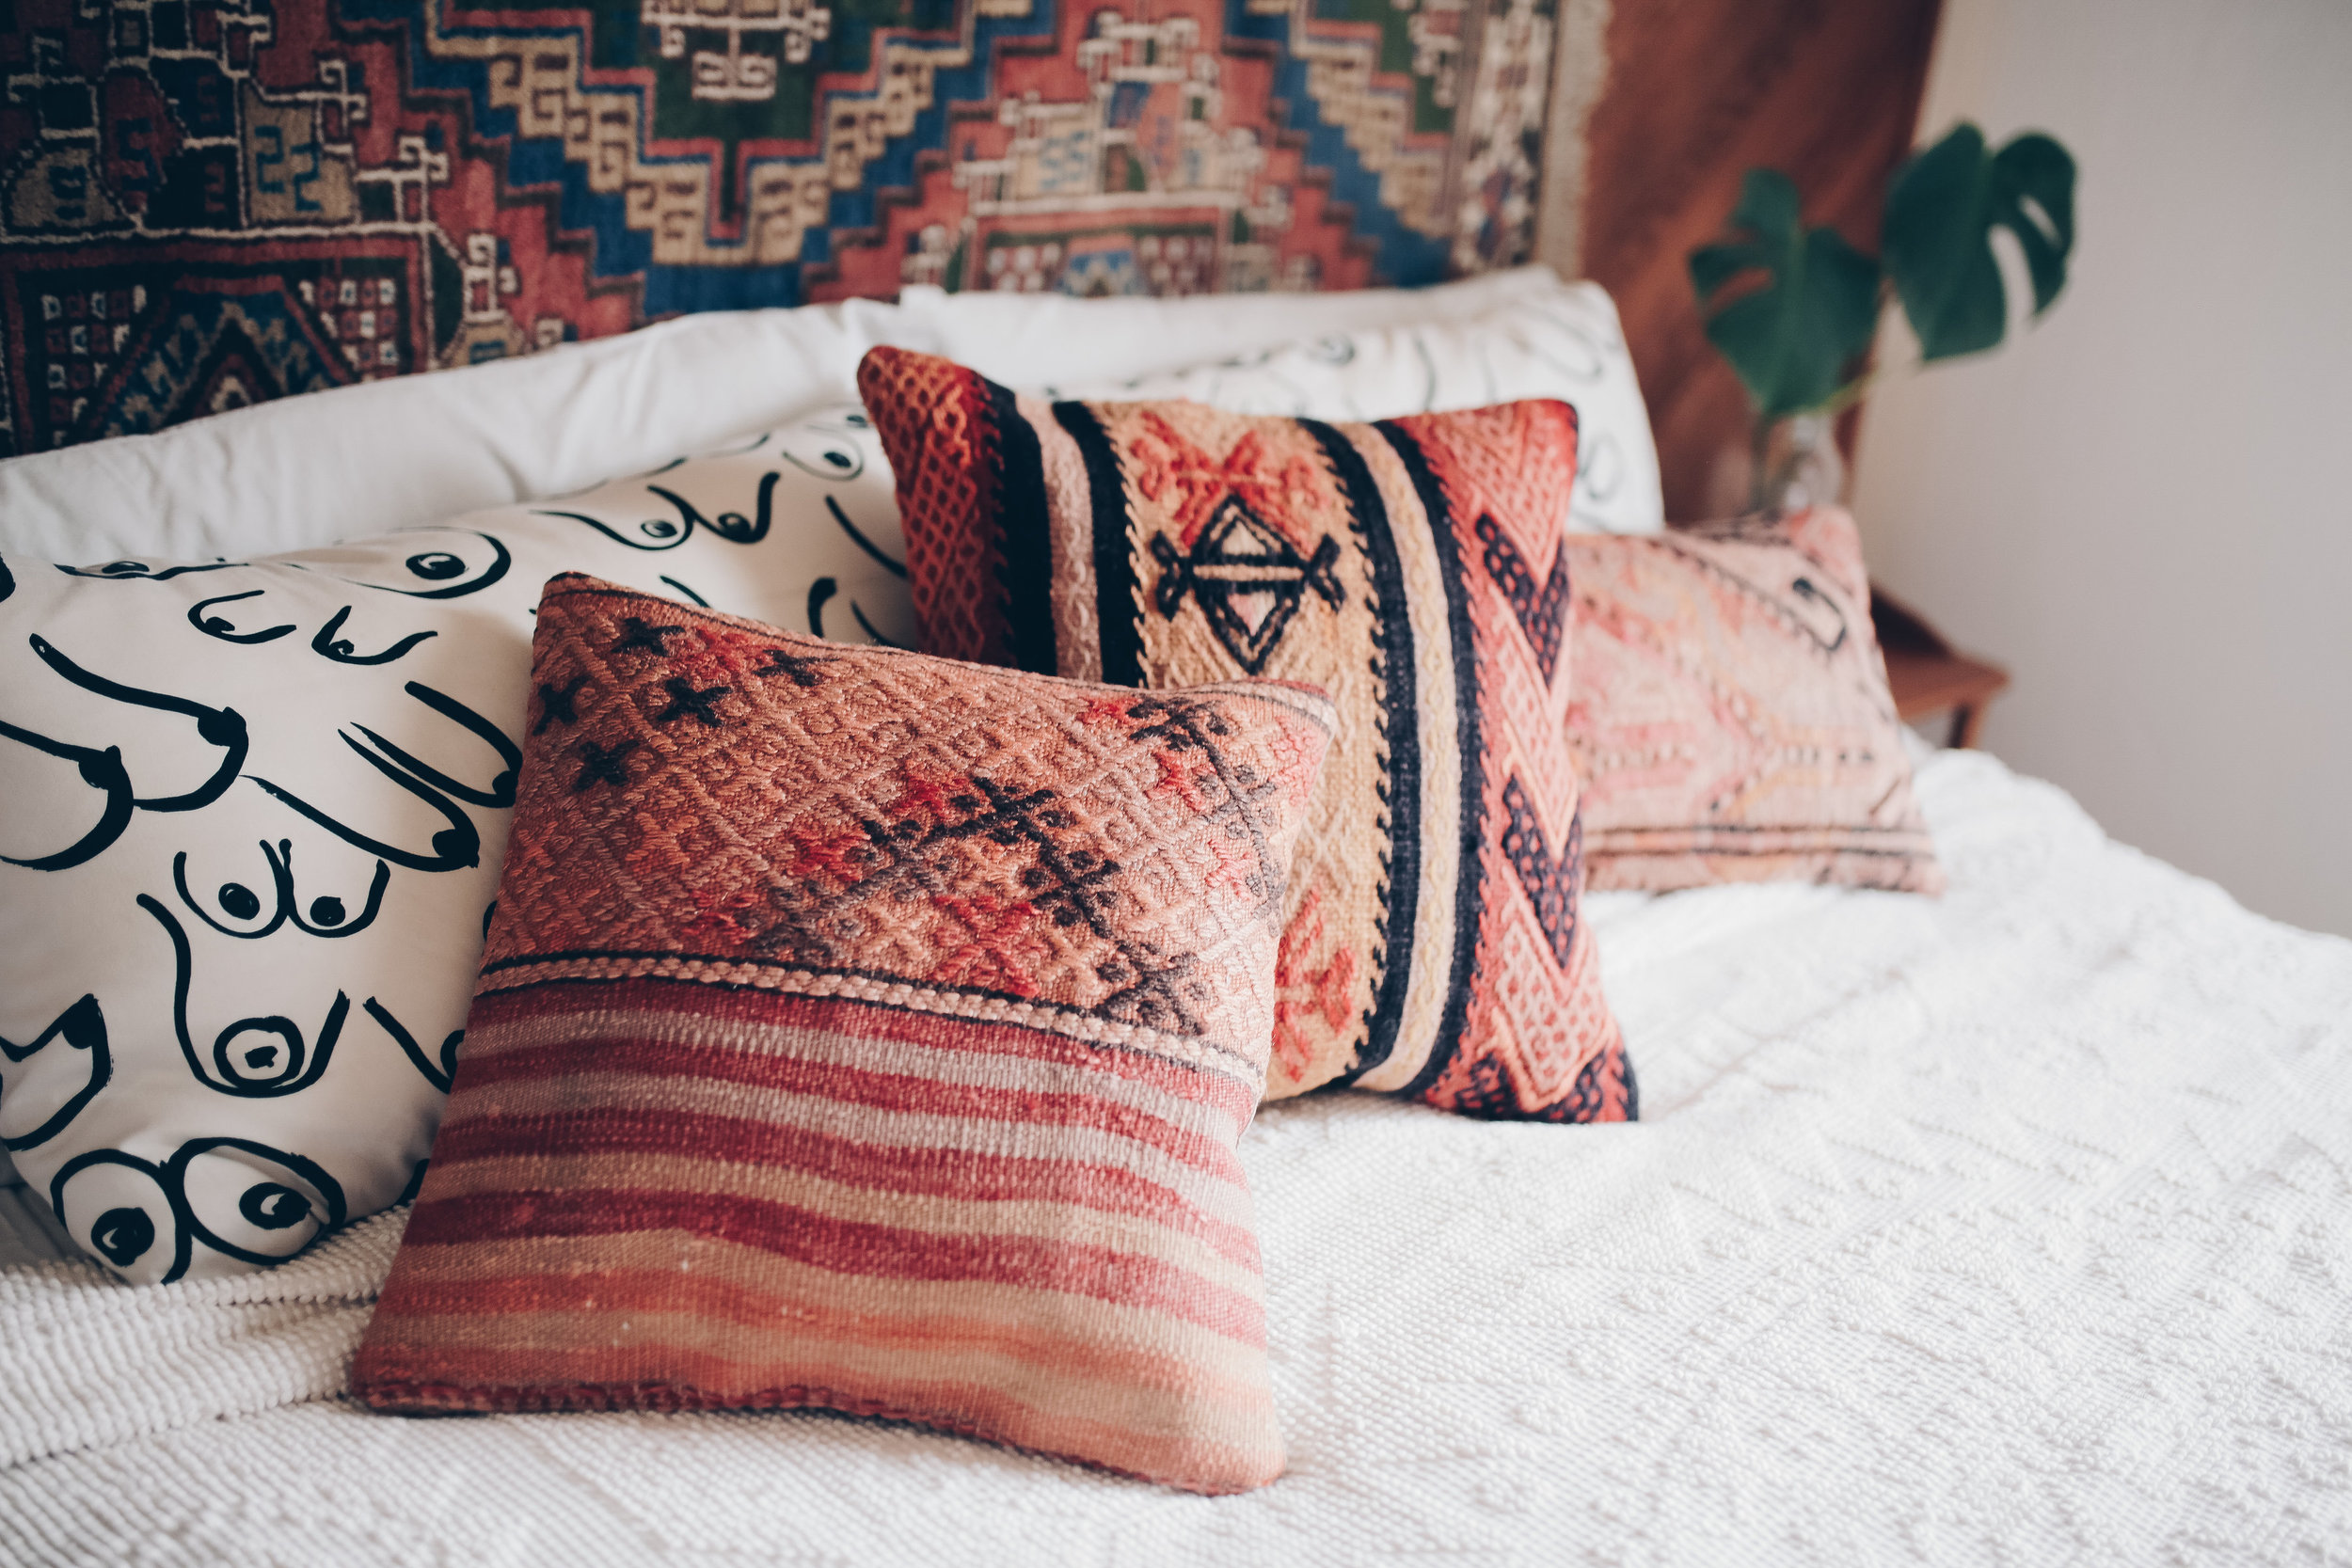 bright boho pillow covers, kilim pillows from foragedhome.com